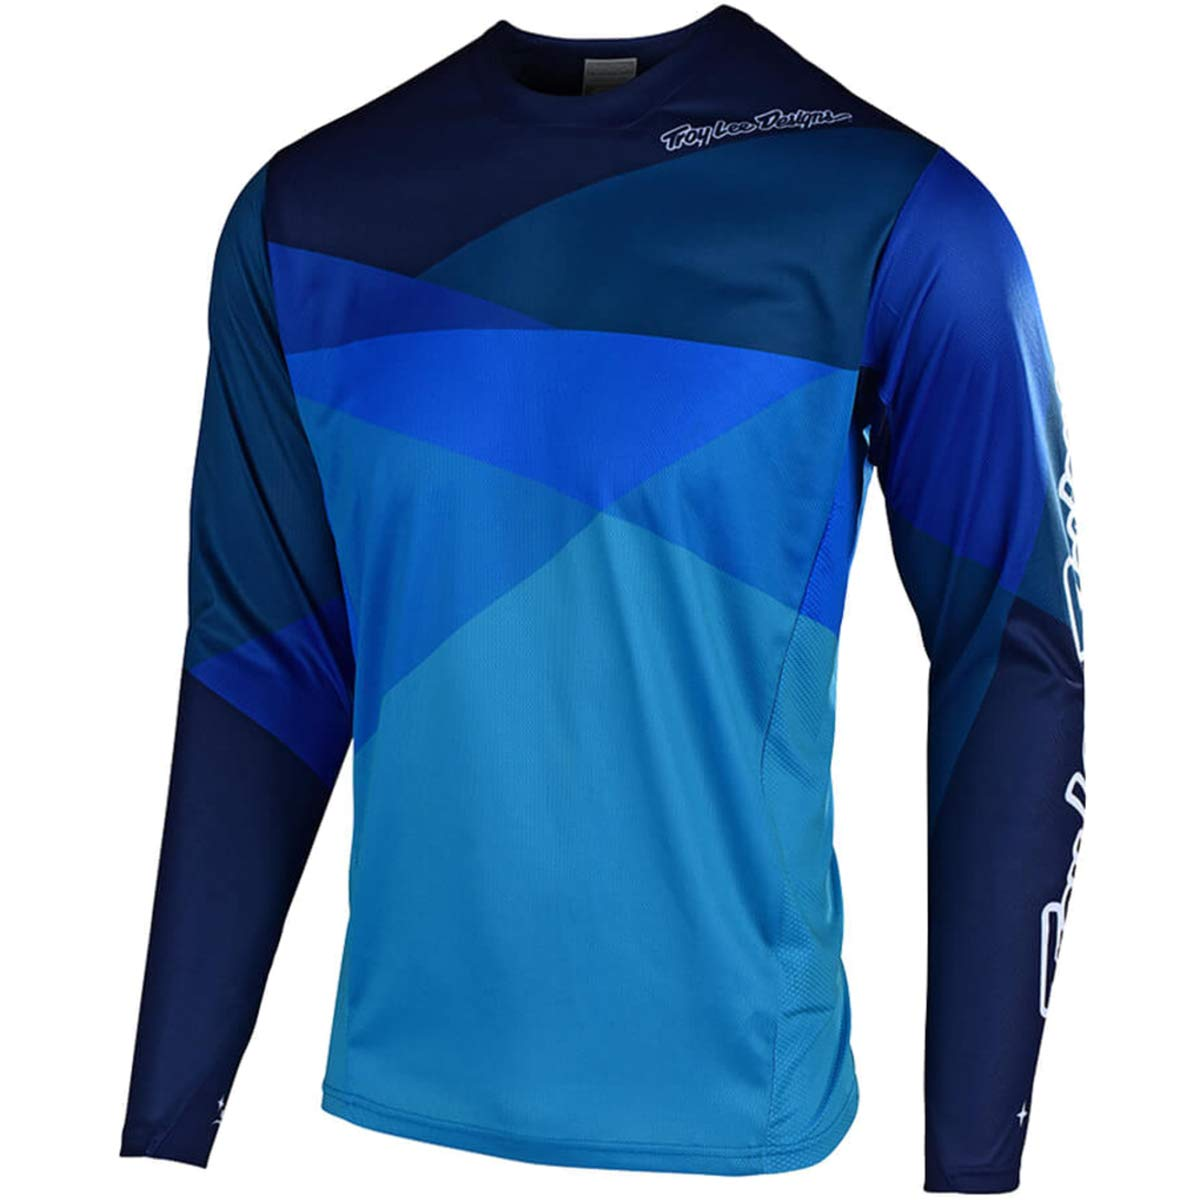 Troy Lee Designs Sprint Jersey - Boys' Jet Blue, L by Troy Lee Designs